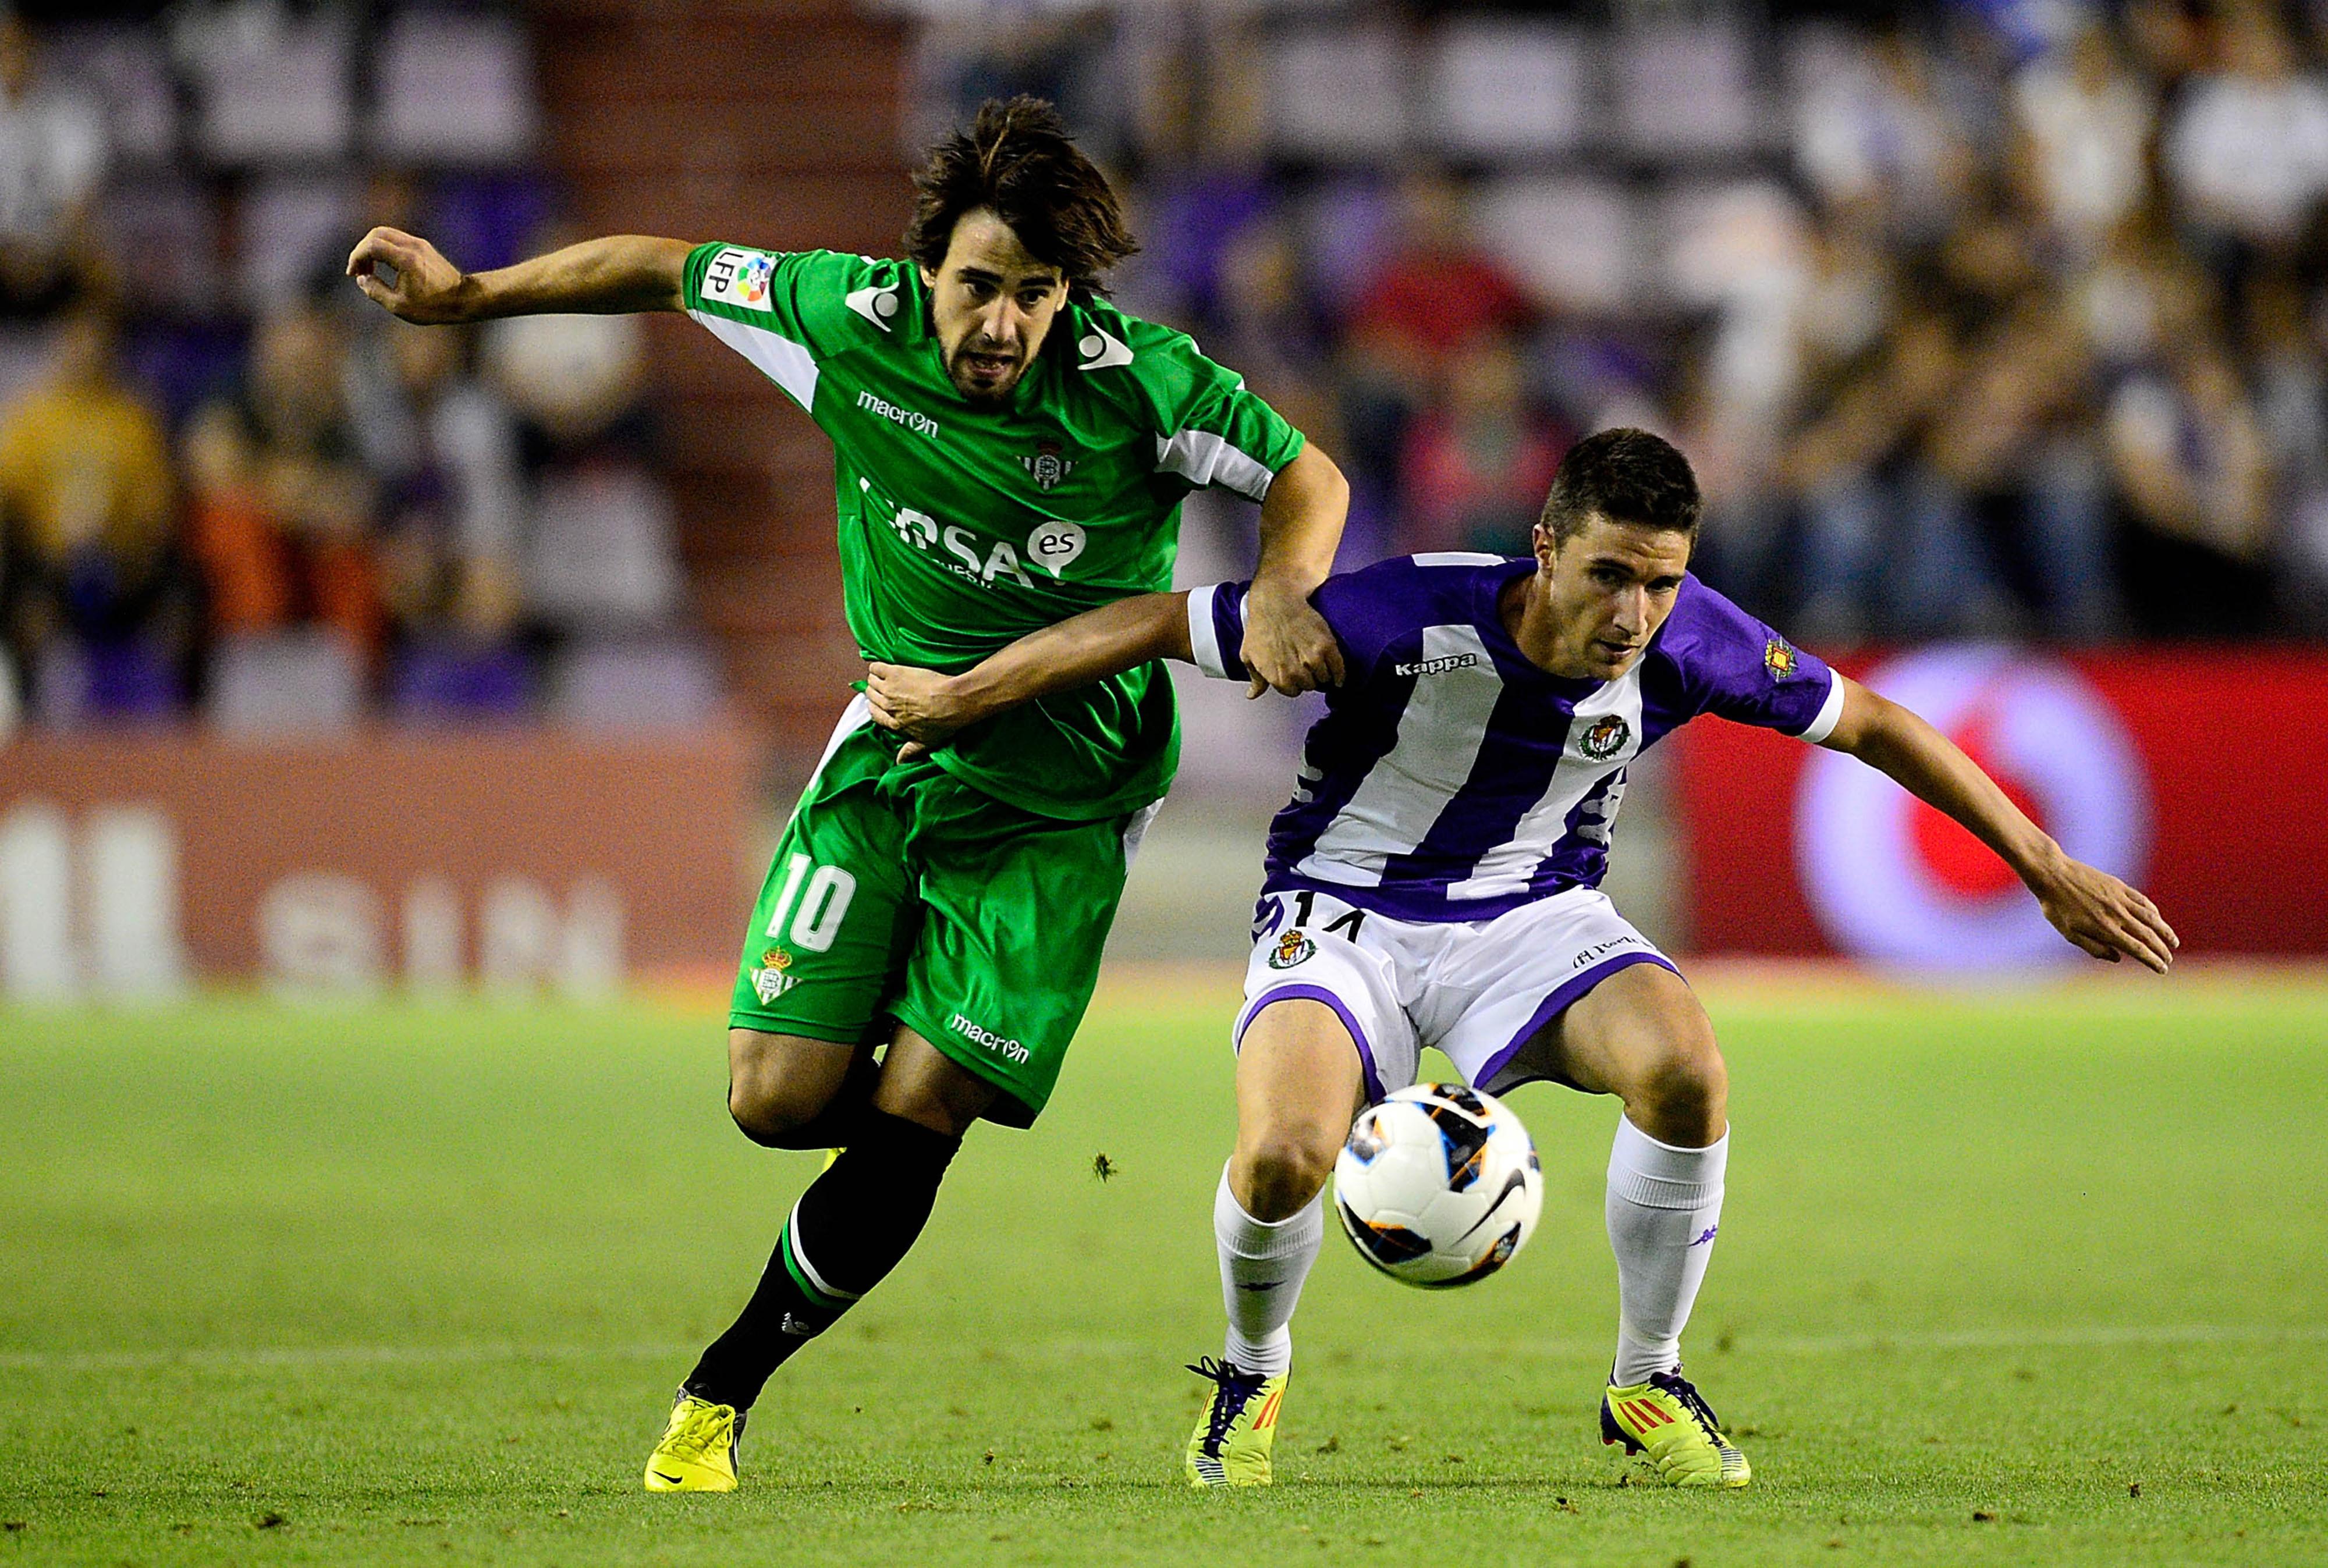 Beñat Etxebarria transfer to Atheltic Bilbao confirmed